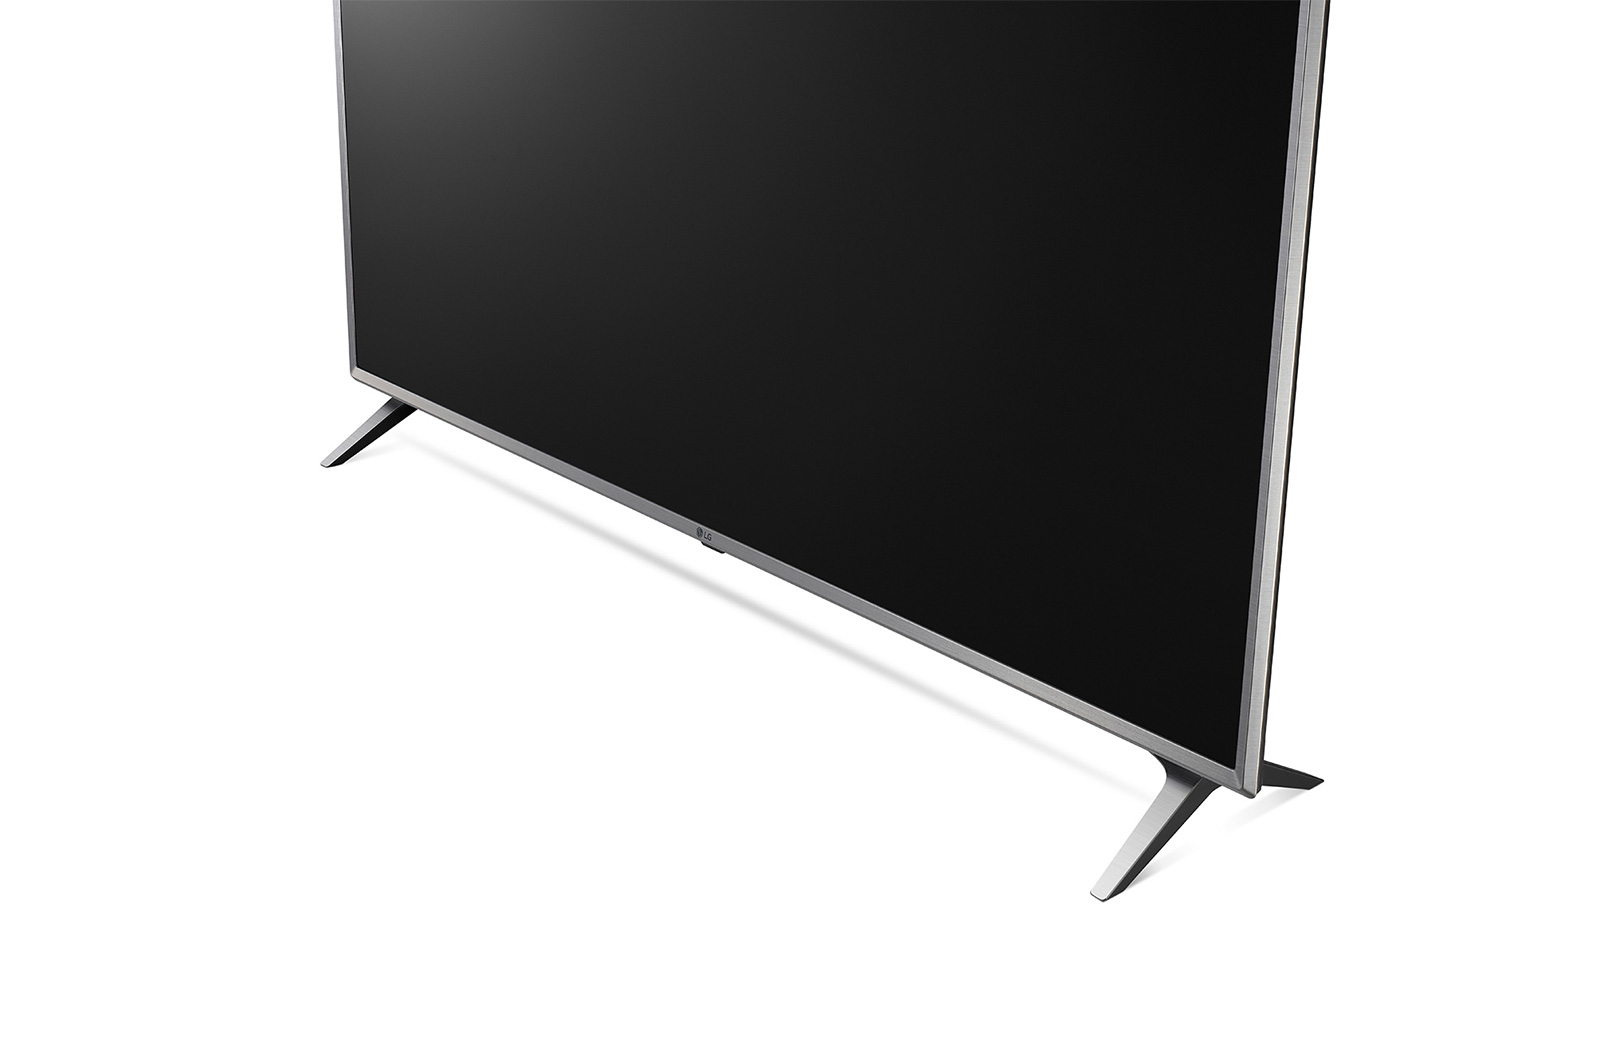 433ba6c81 LG 50UK6500PLA LED TV 127 cm (50